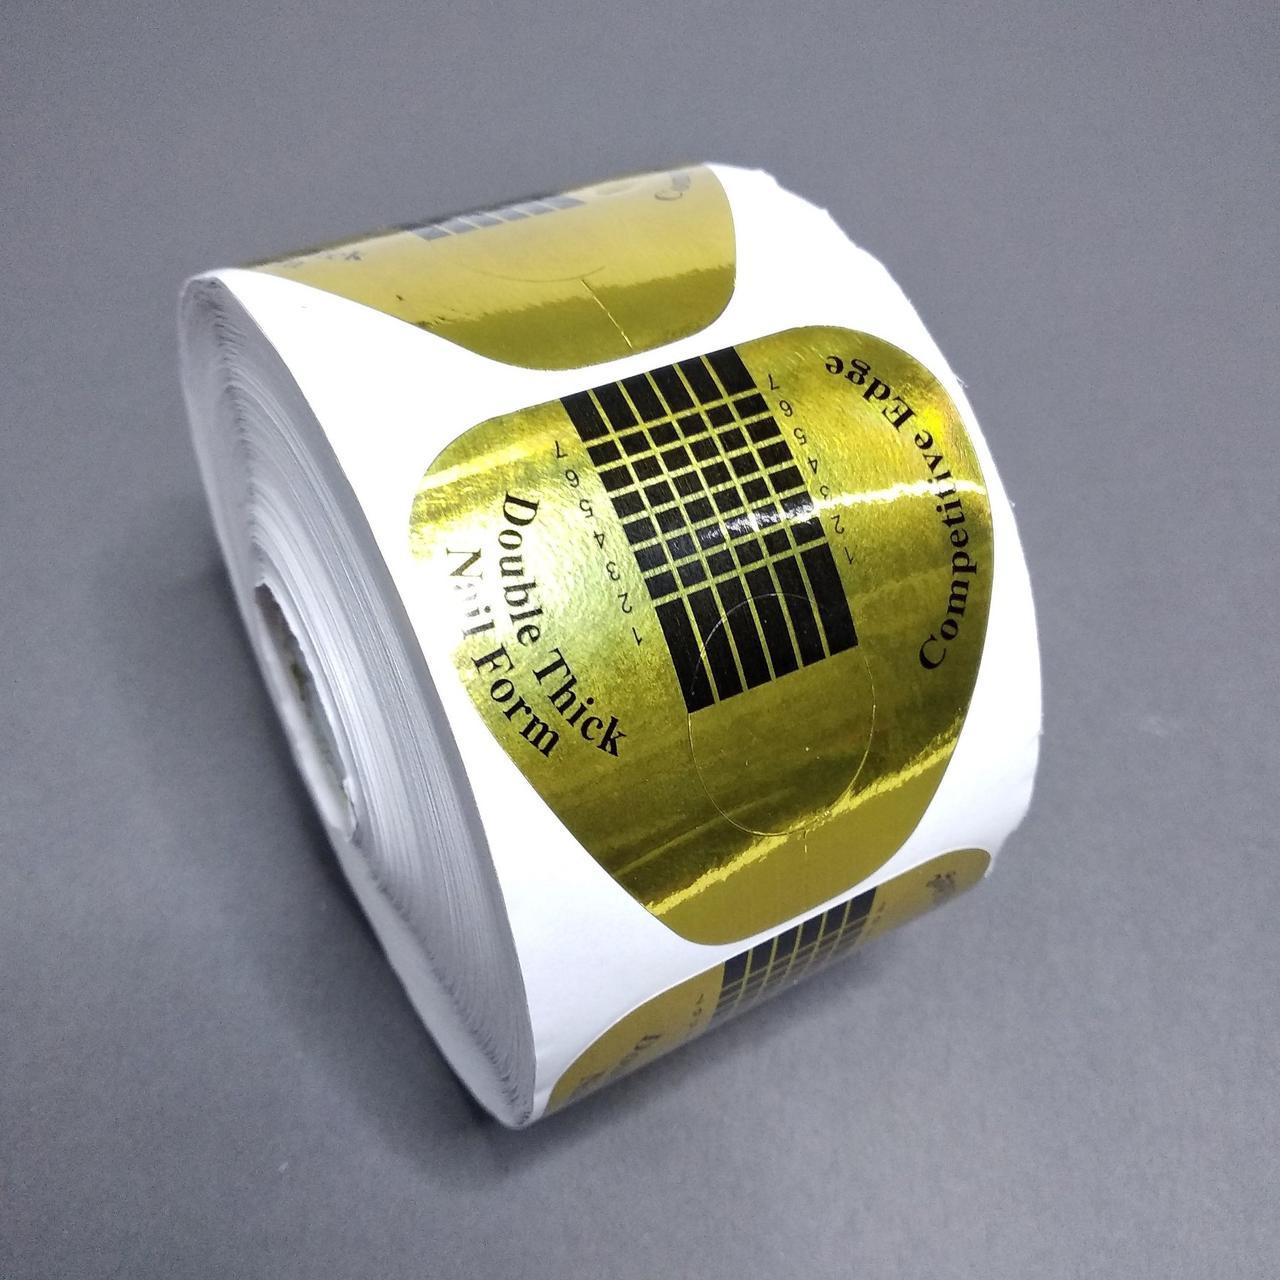 Формы для наращивания ногтей 50 шт Global Fashion